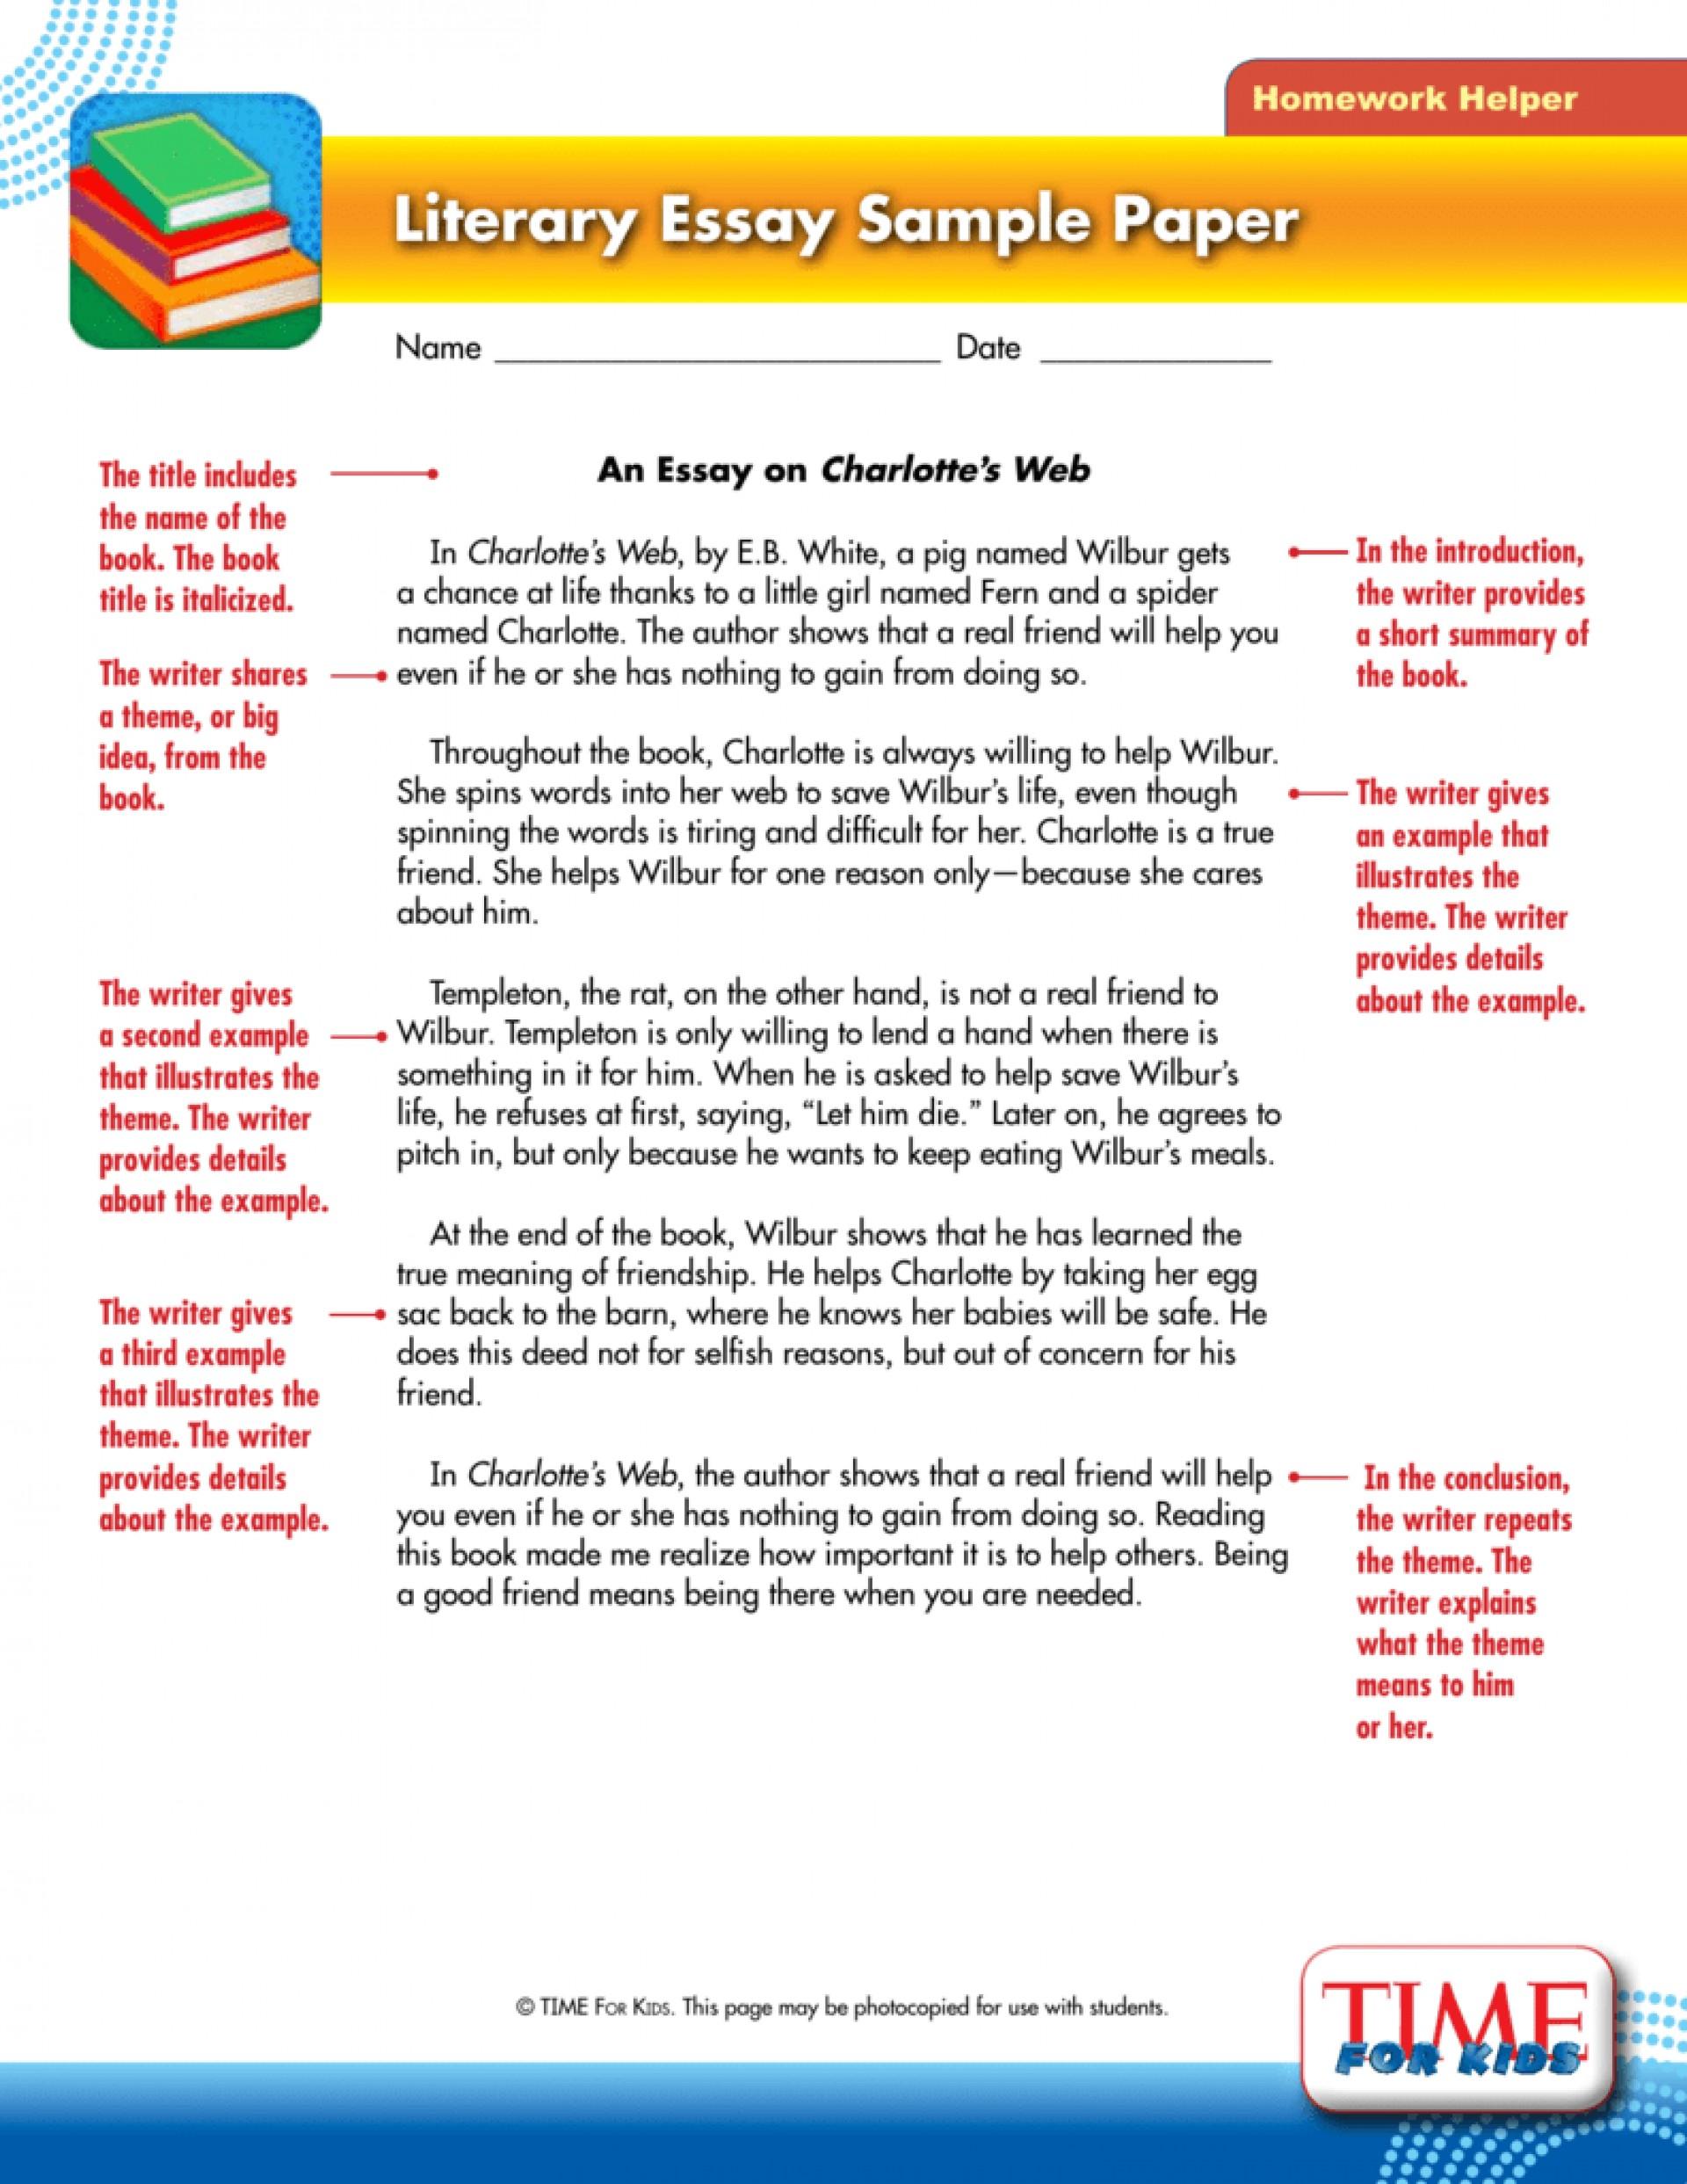 006 008656625 1 Essay Example Unique Literary Rubric 4th Grade Conclusion Writing A 1920